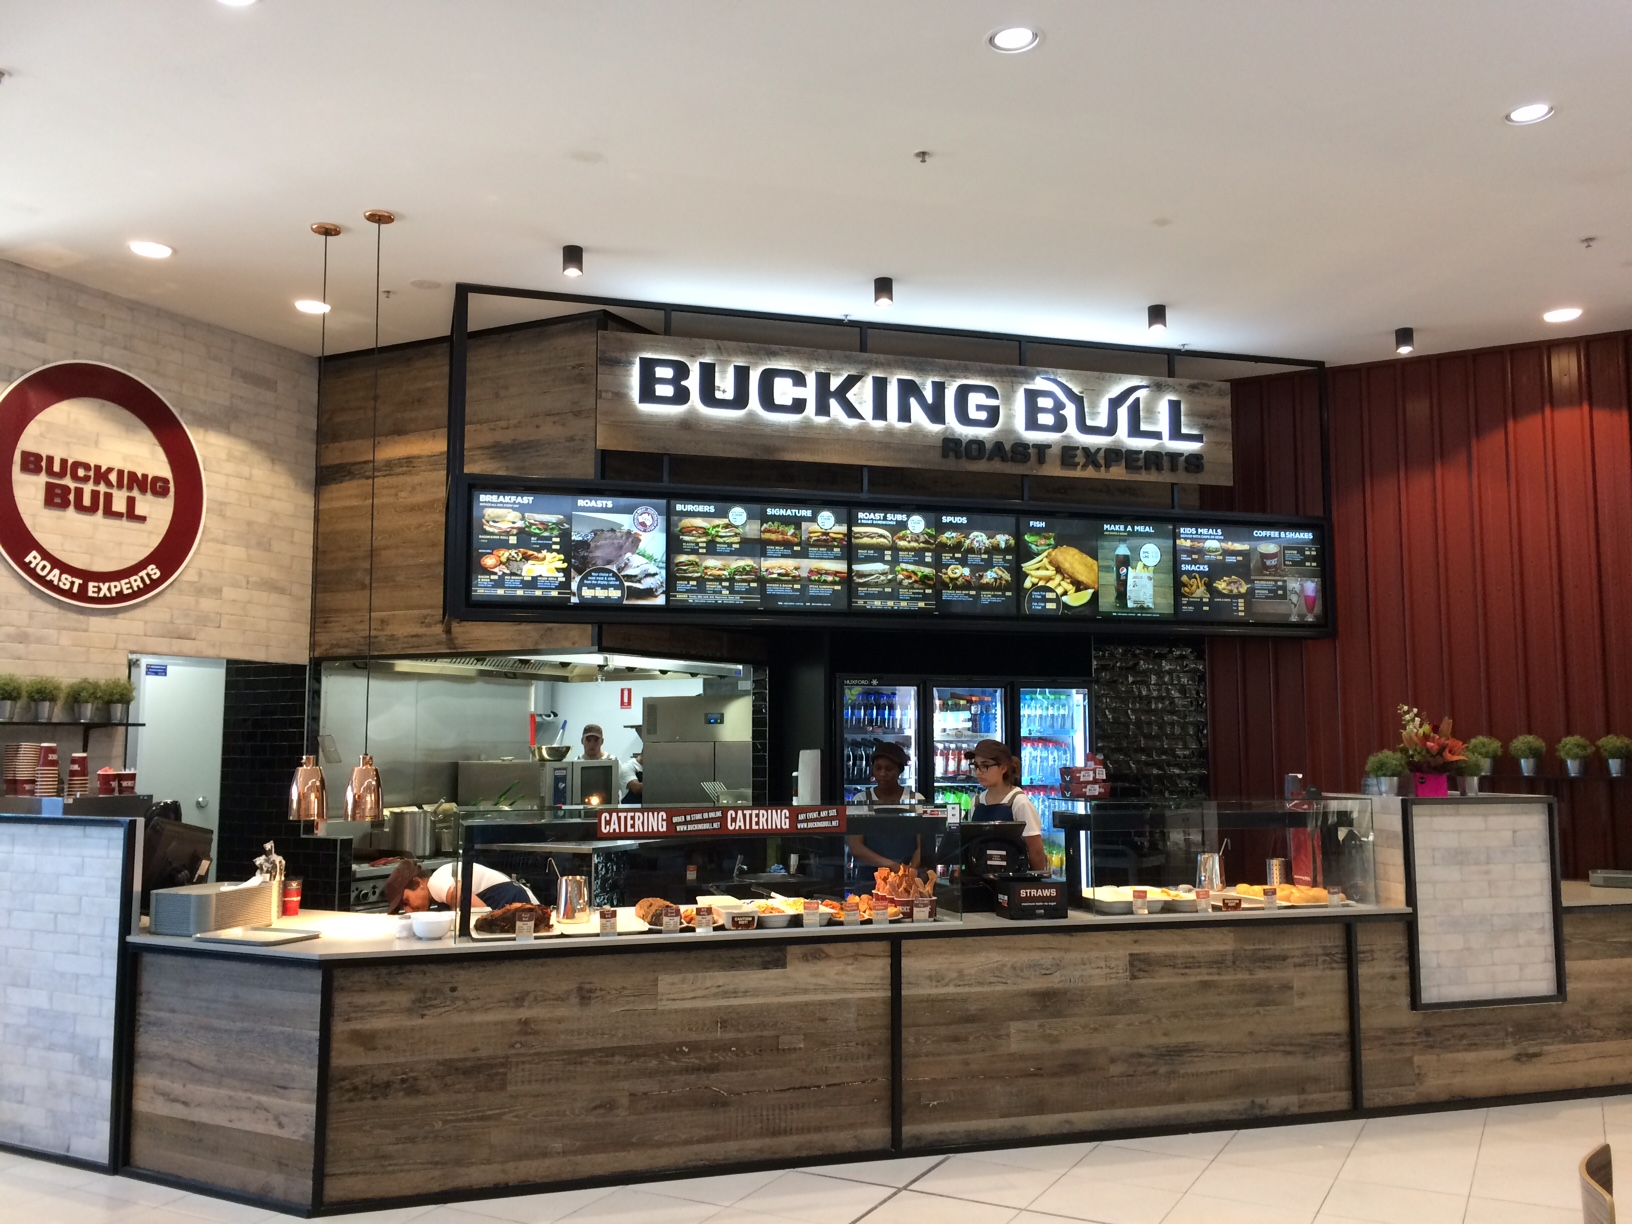 bucking-bull-roast-experts-food-takeaway-shop-hervey-bay-5